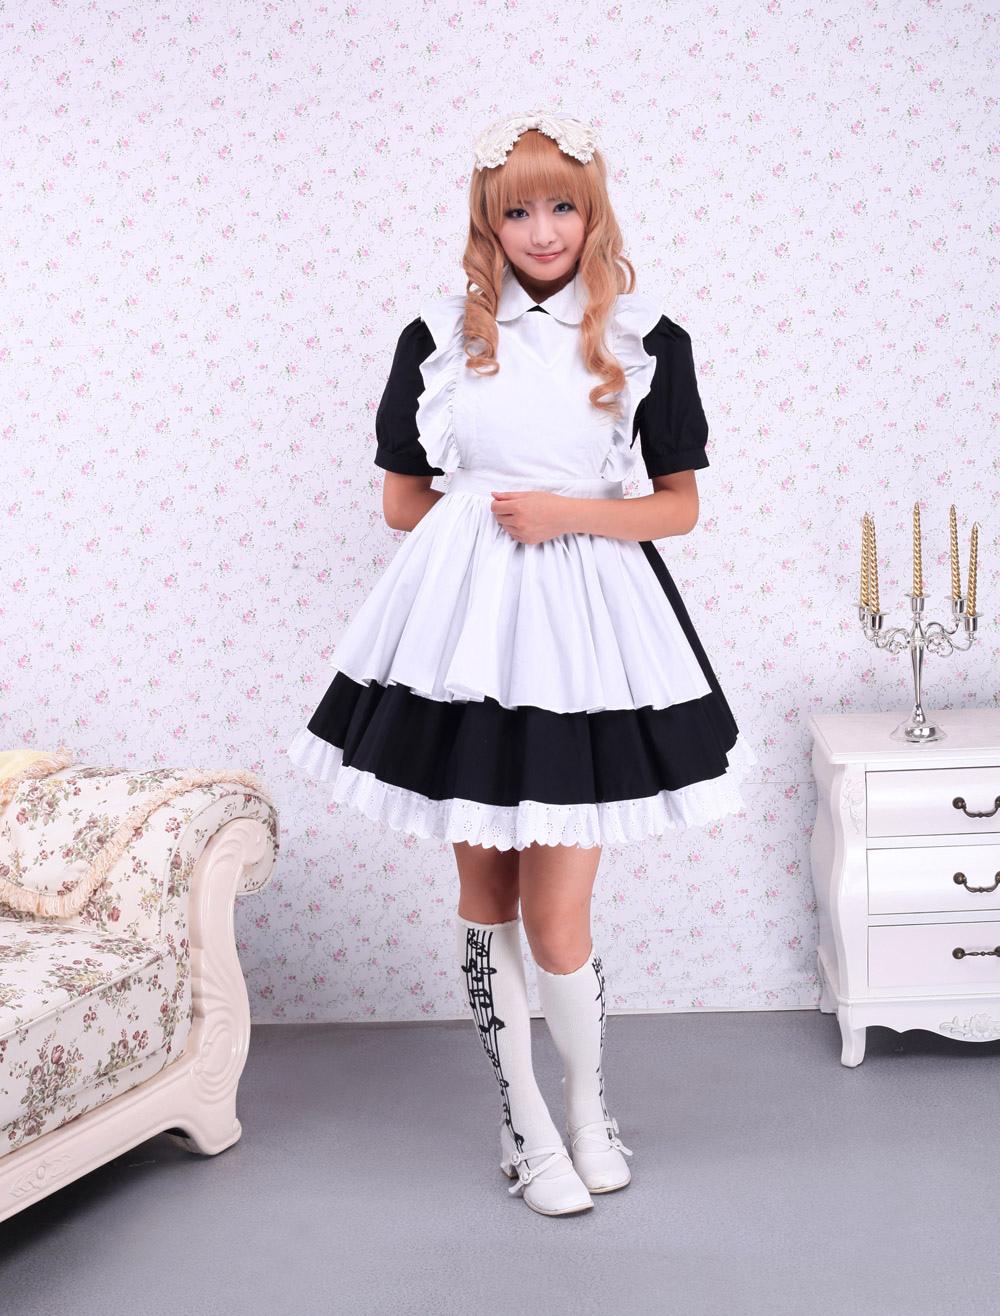 White apron cotton - Lolitashow Cotton Black Maid Lolita Op Dress White Apron Short Sleeves Lolitashow Com